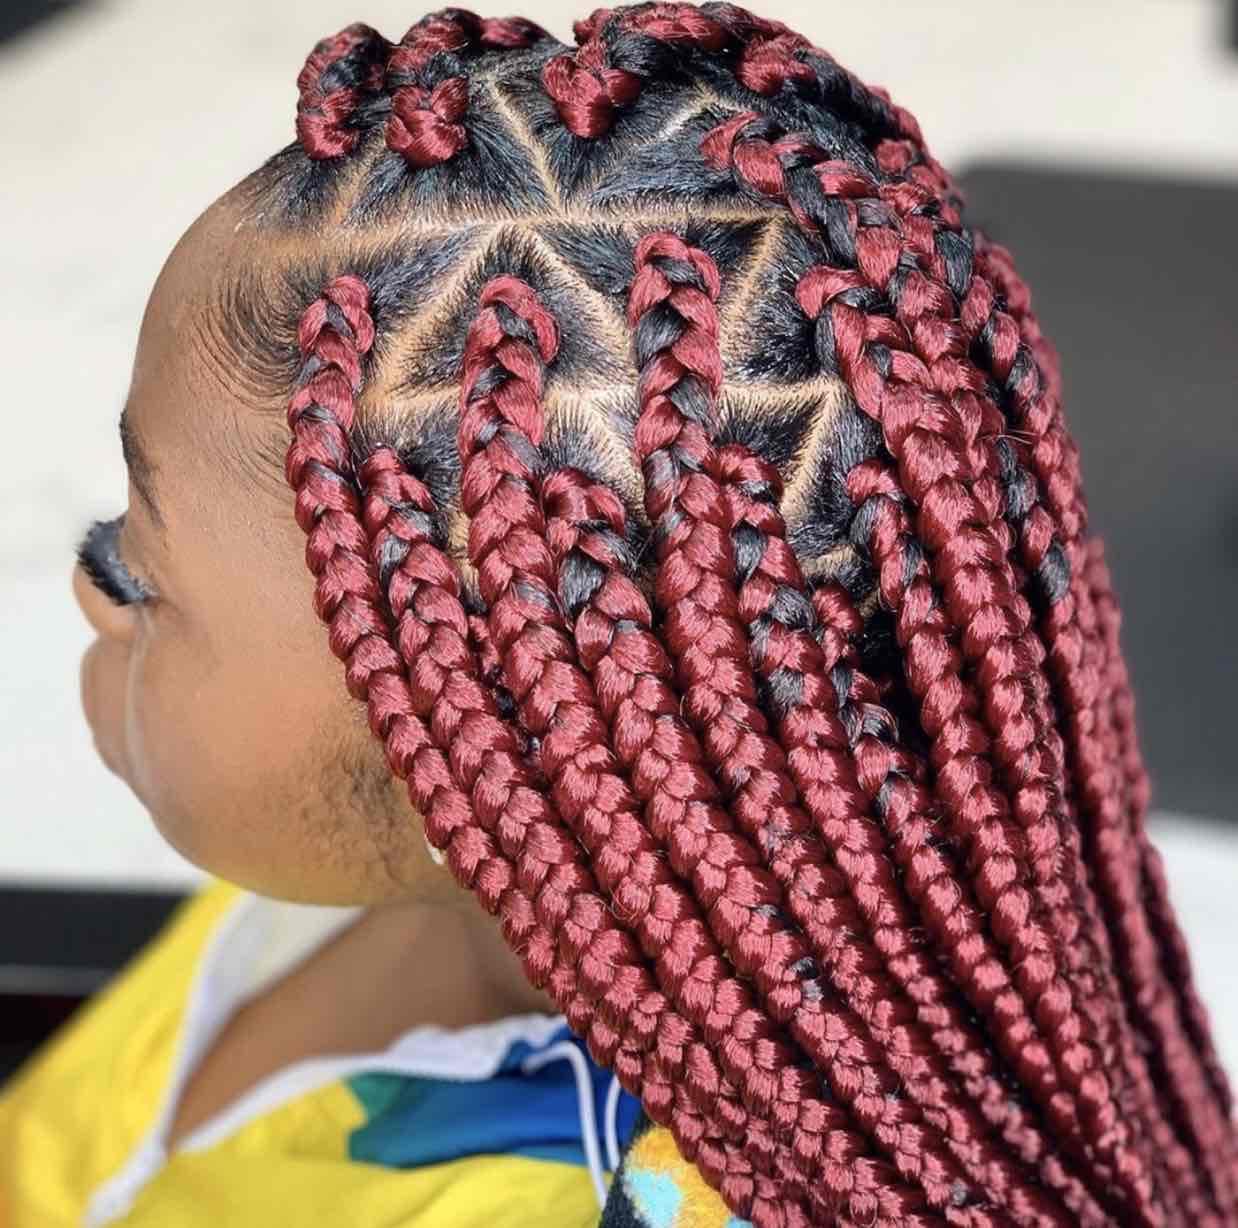 salon de coiffure afro tresse tresses box braids crochet braids vanilles tissages paris 75 77 78 91 92 93 94 95 CFAMDNWQ